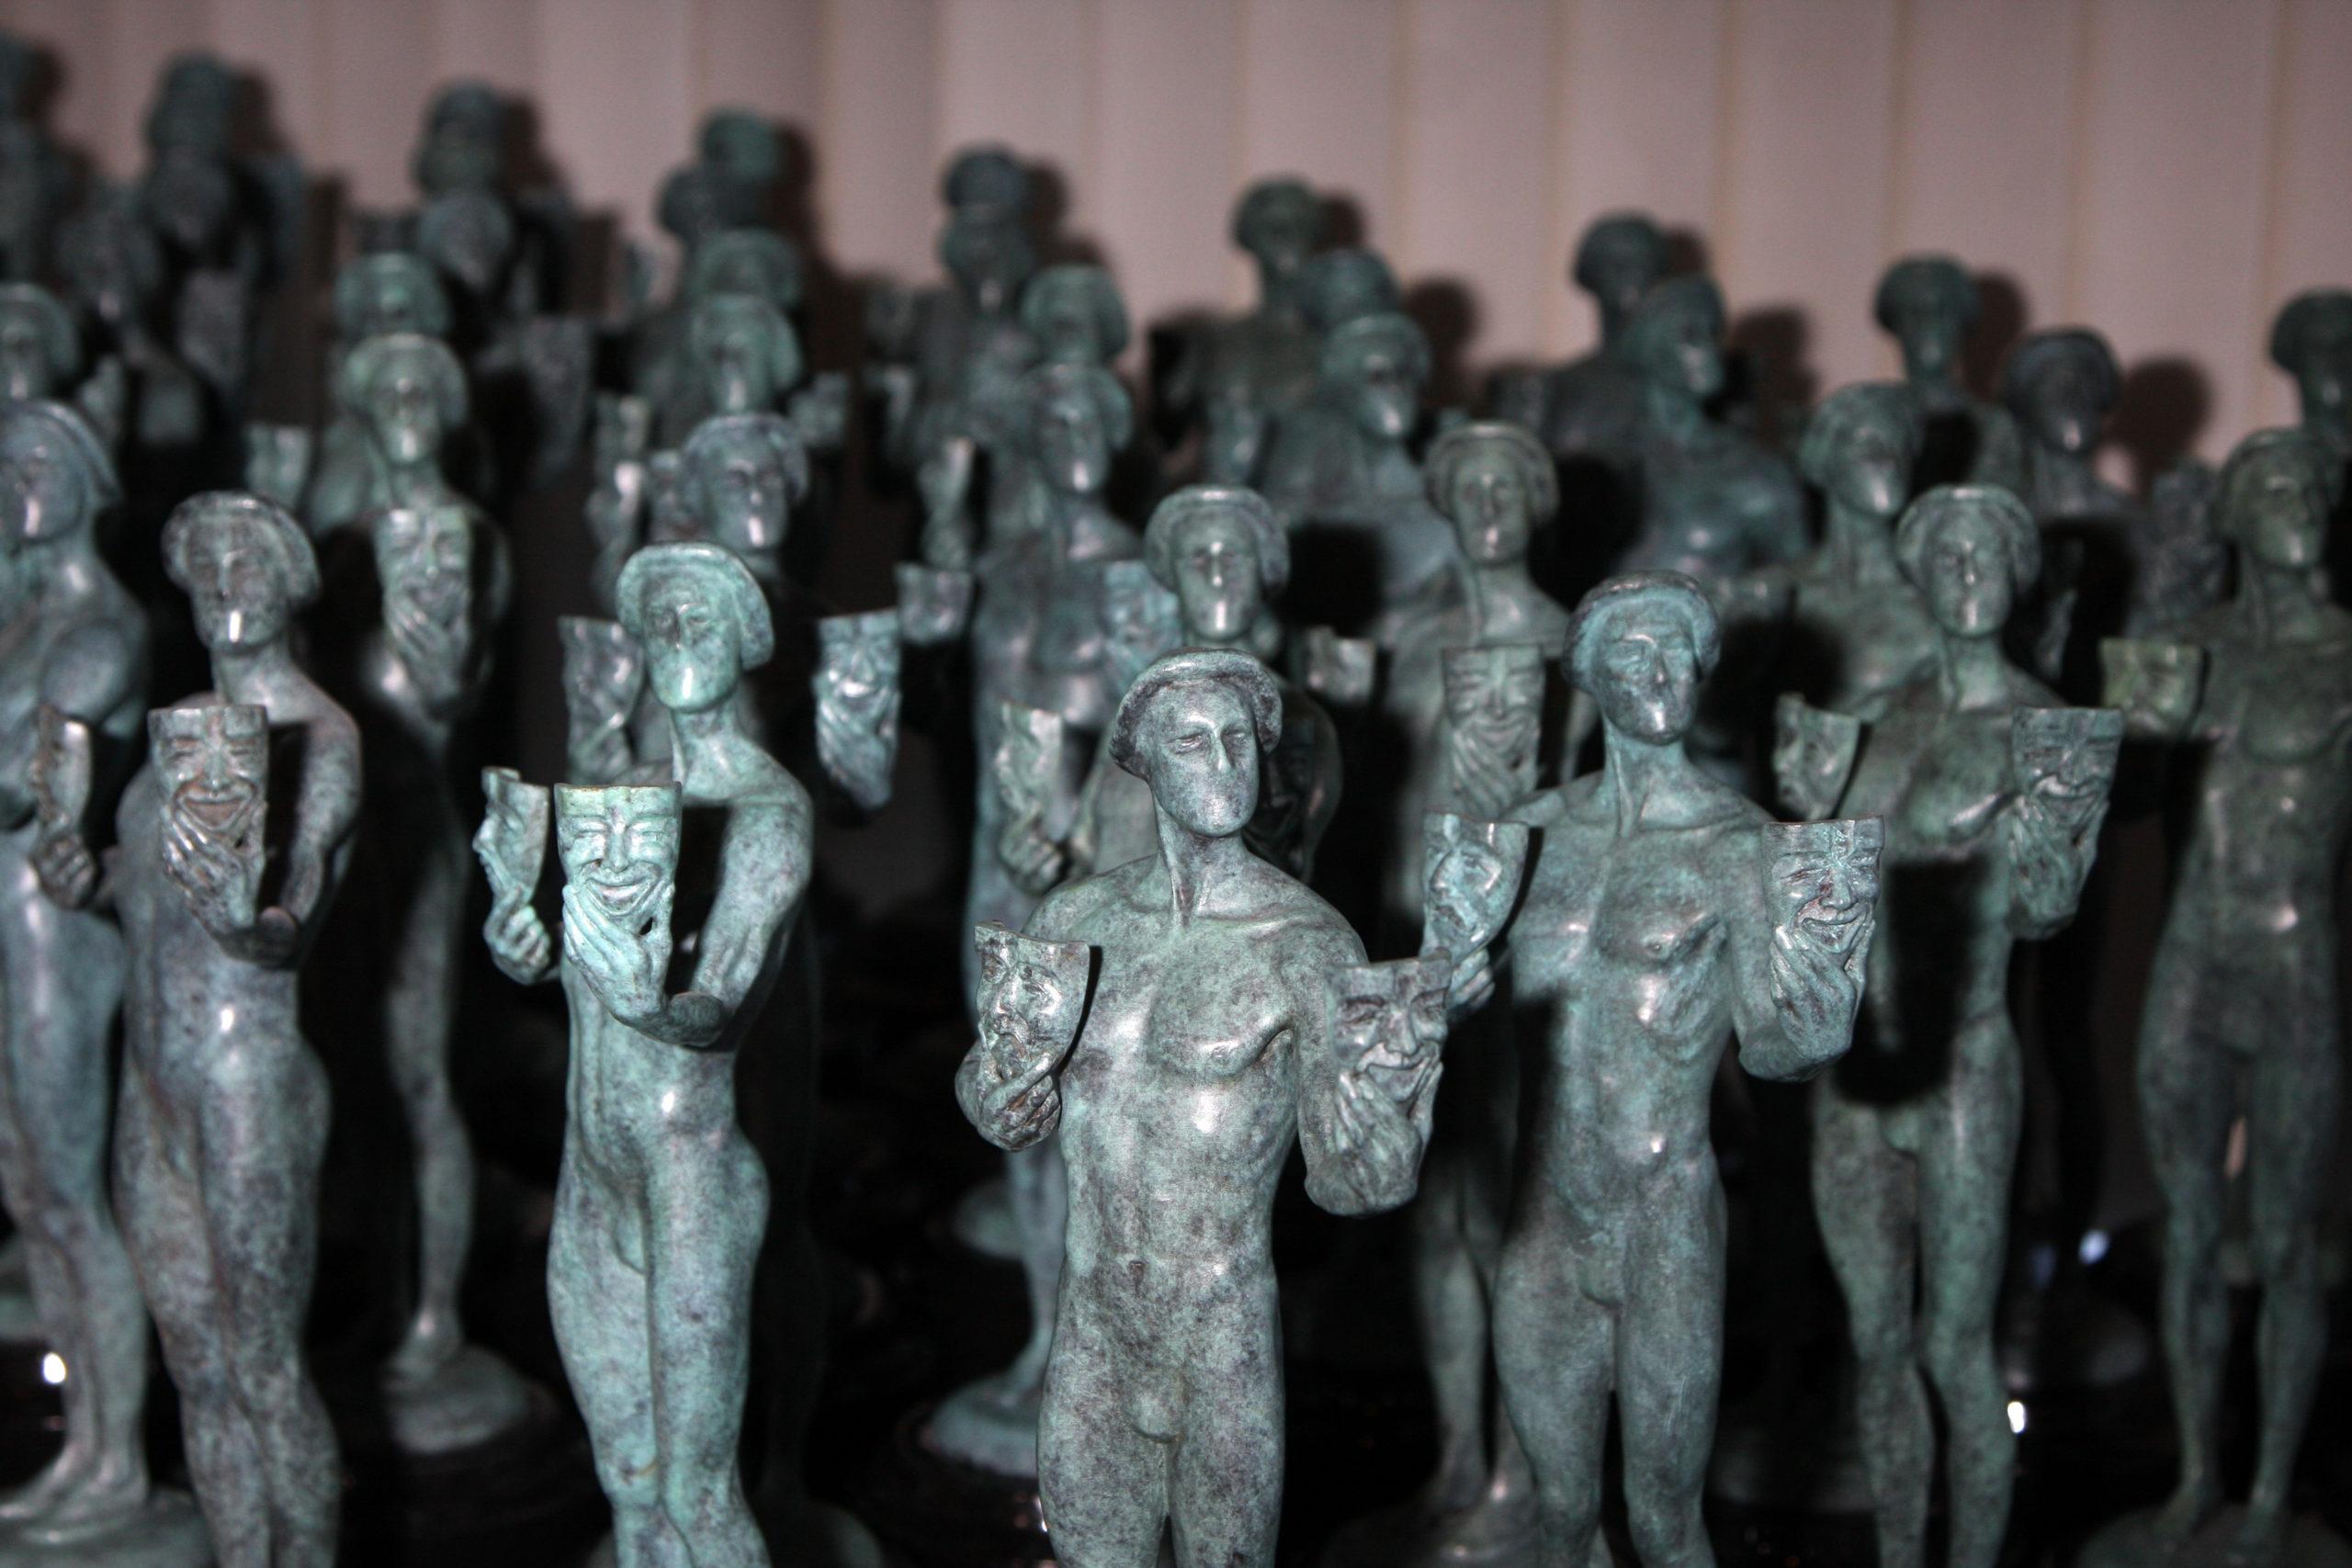 SAG Awards Winners 2021: Complete List of Winners